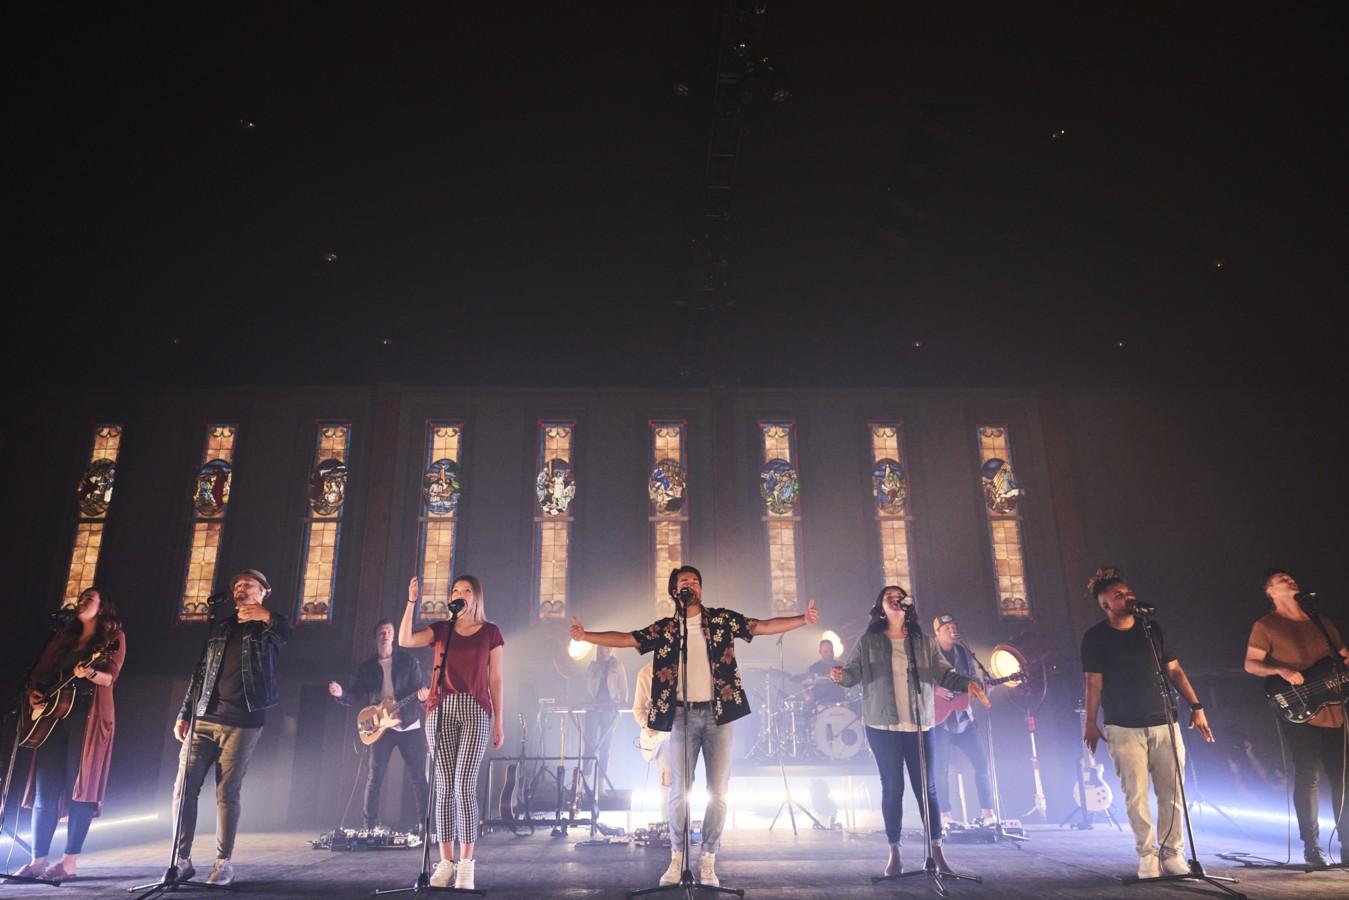 North Point Worship - Abundantly More (Live)